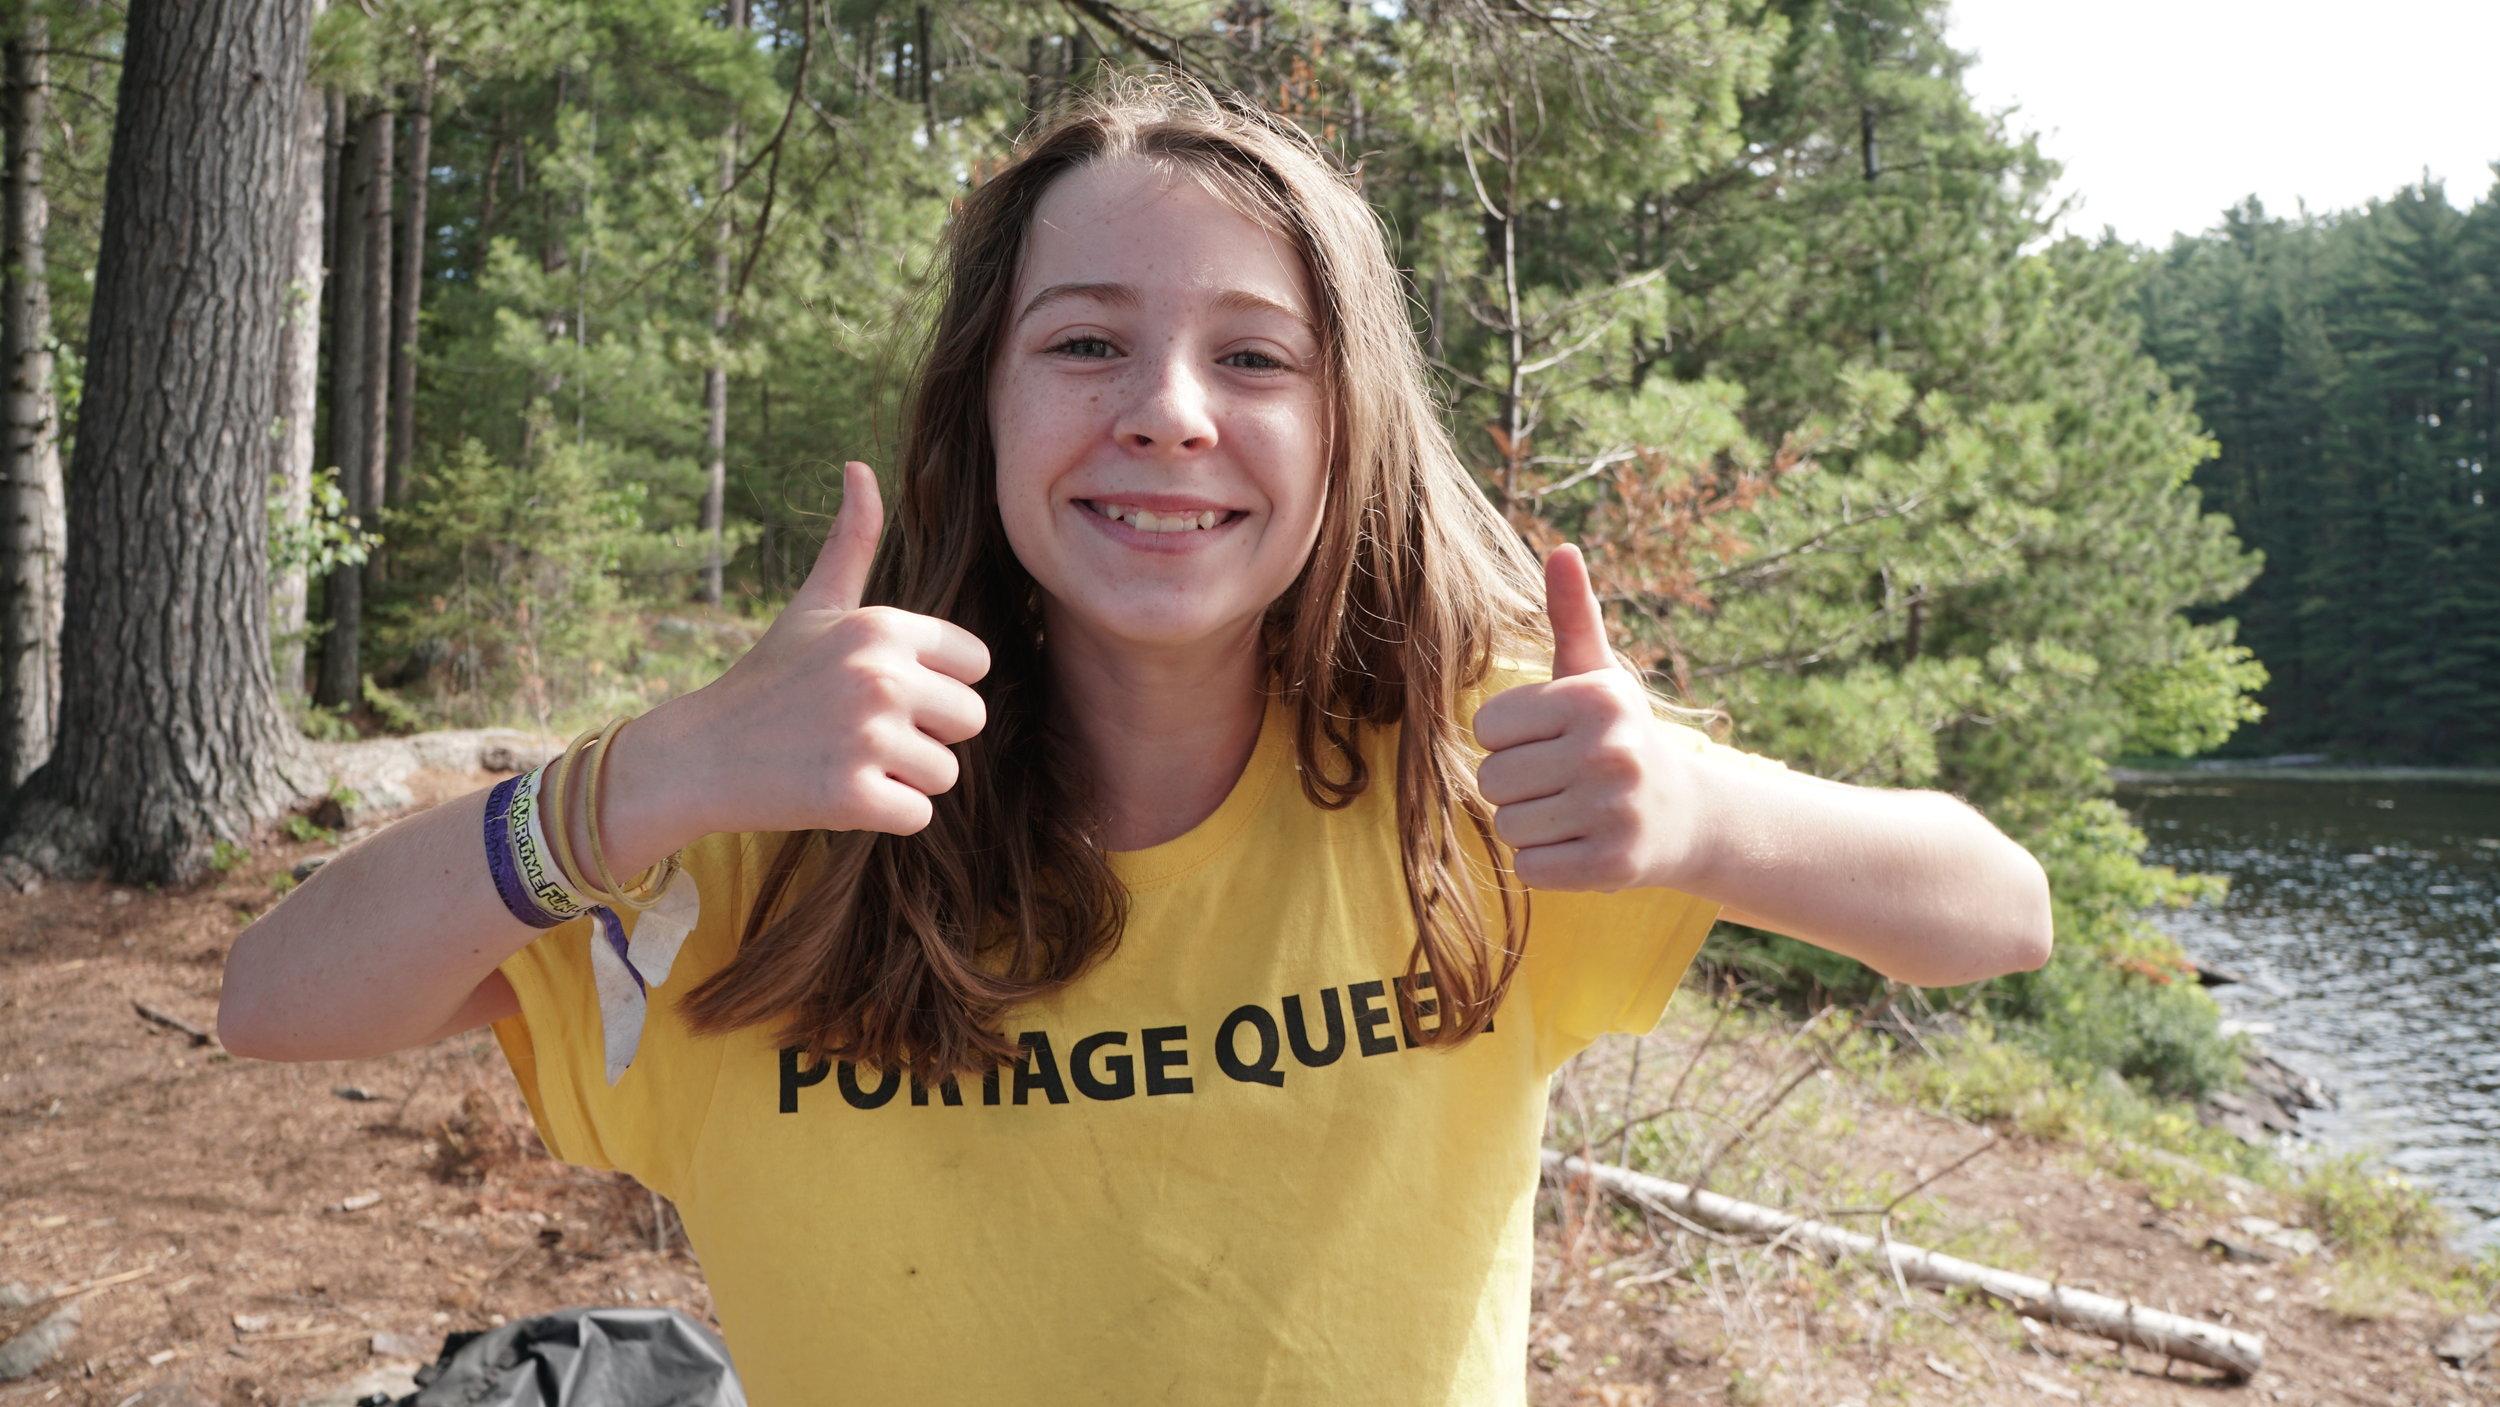 kyla my 12 yr old daughter.JPG